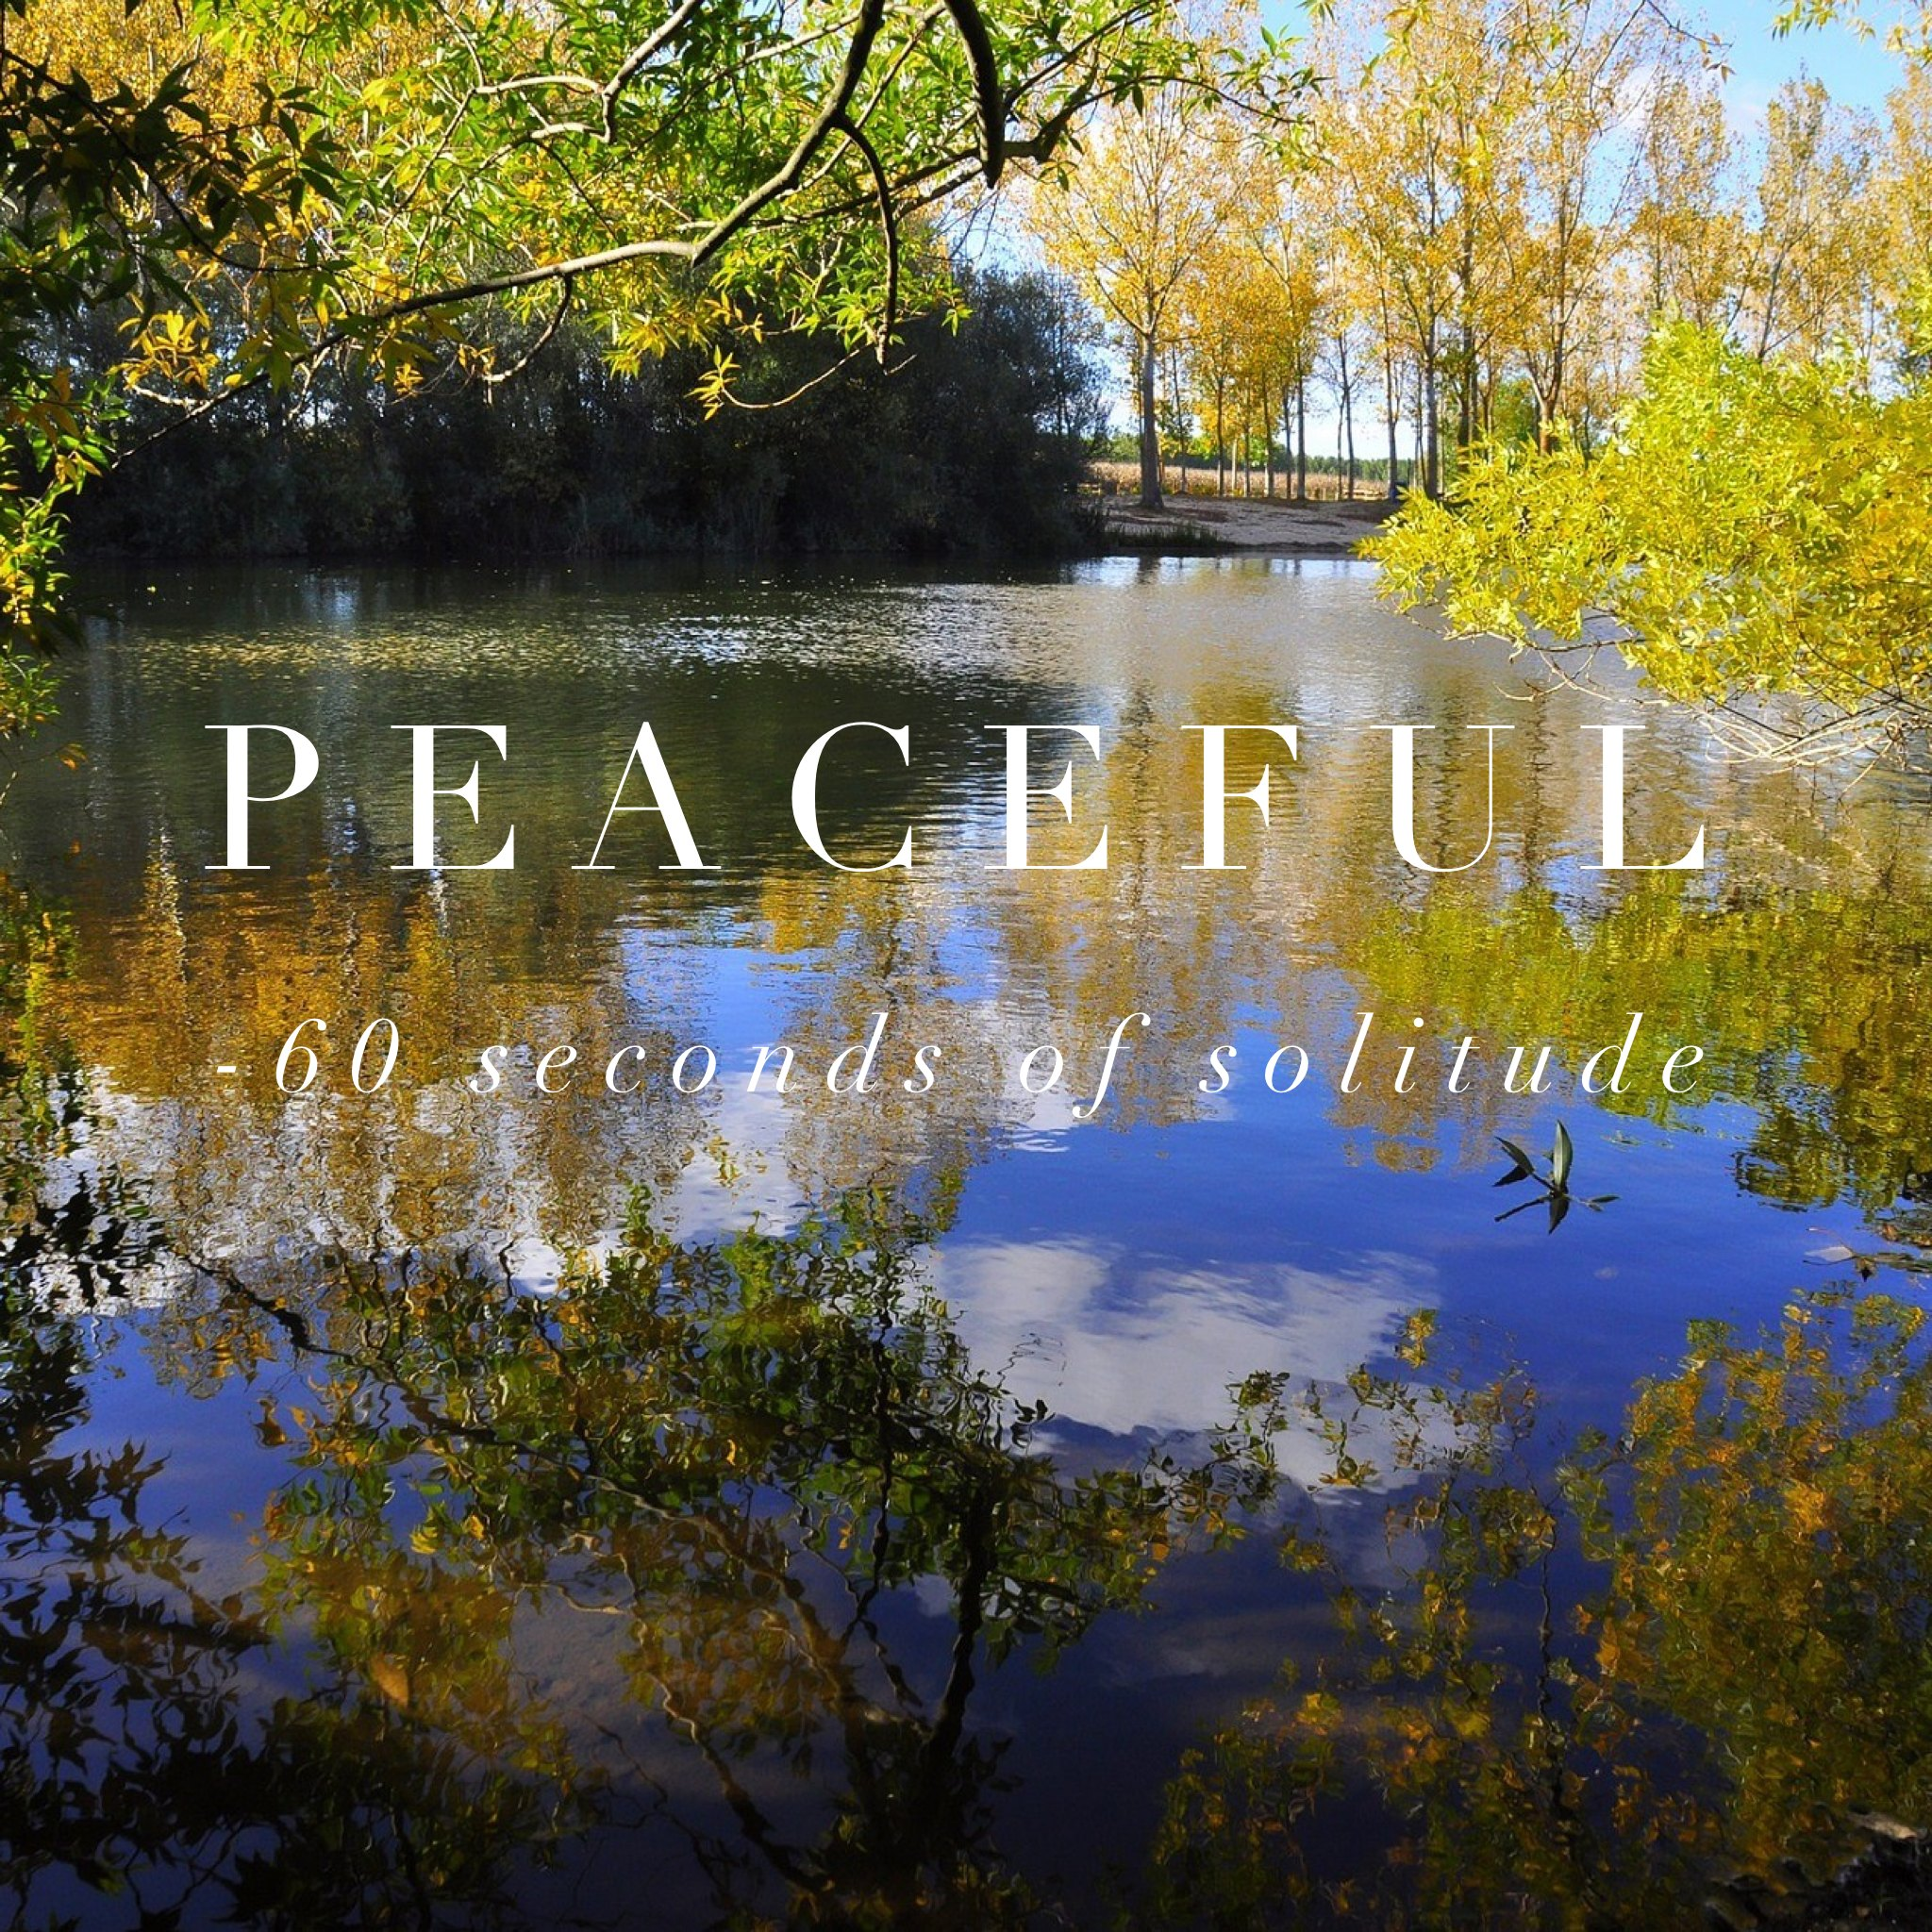 Images Of Peaceful - impremedia.net